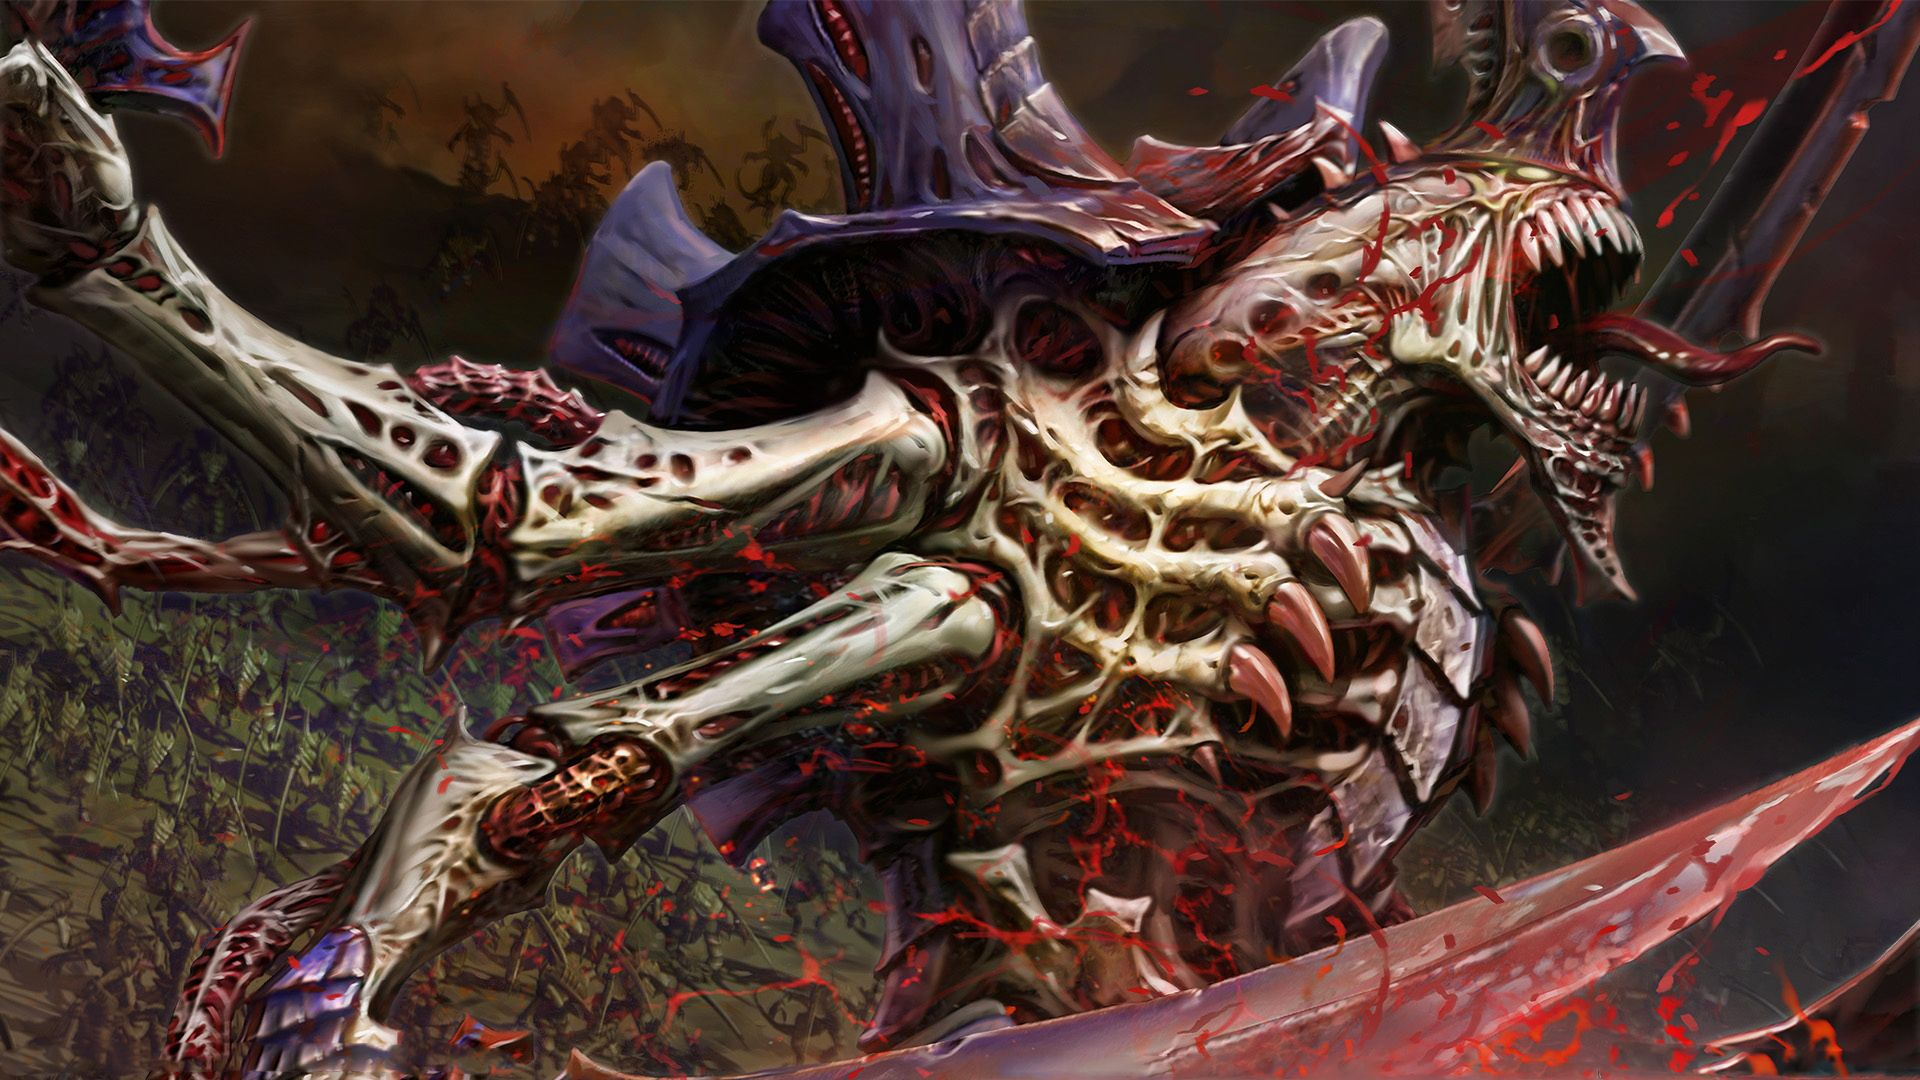 Evil And Darkness Monsters Warhammer 40k Tyranids Hive Tyrant Dark Horror Fantasy Monster Evil Kriegshammer Miniatur